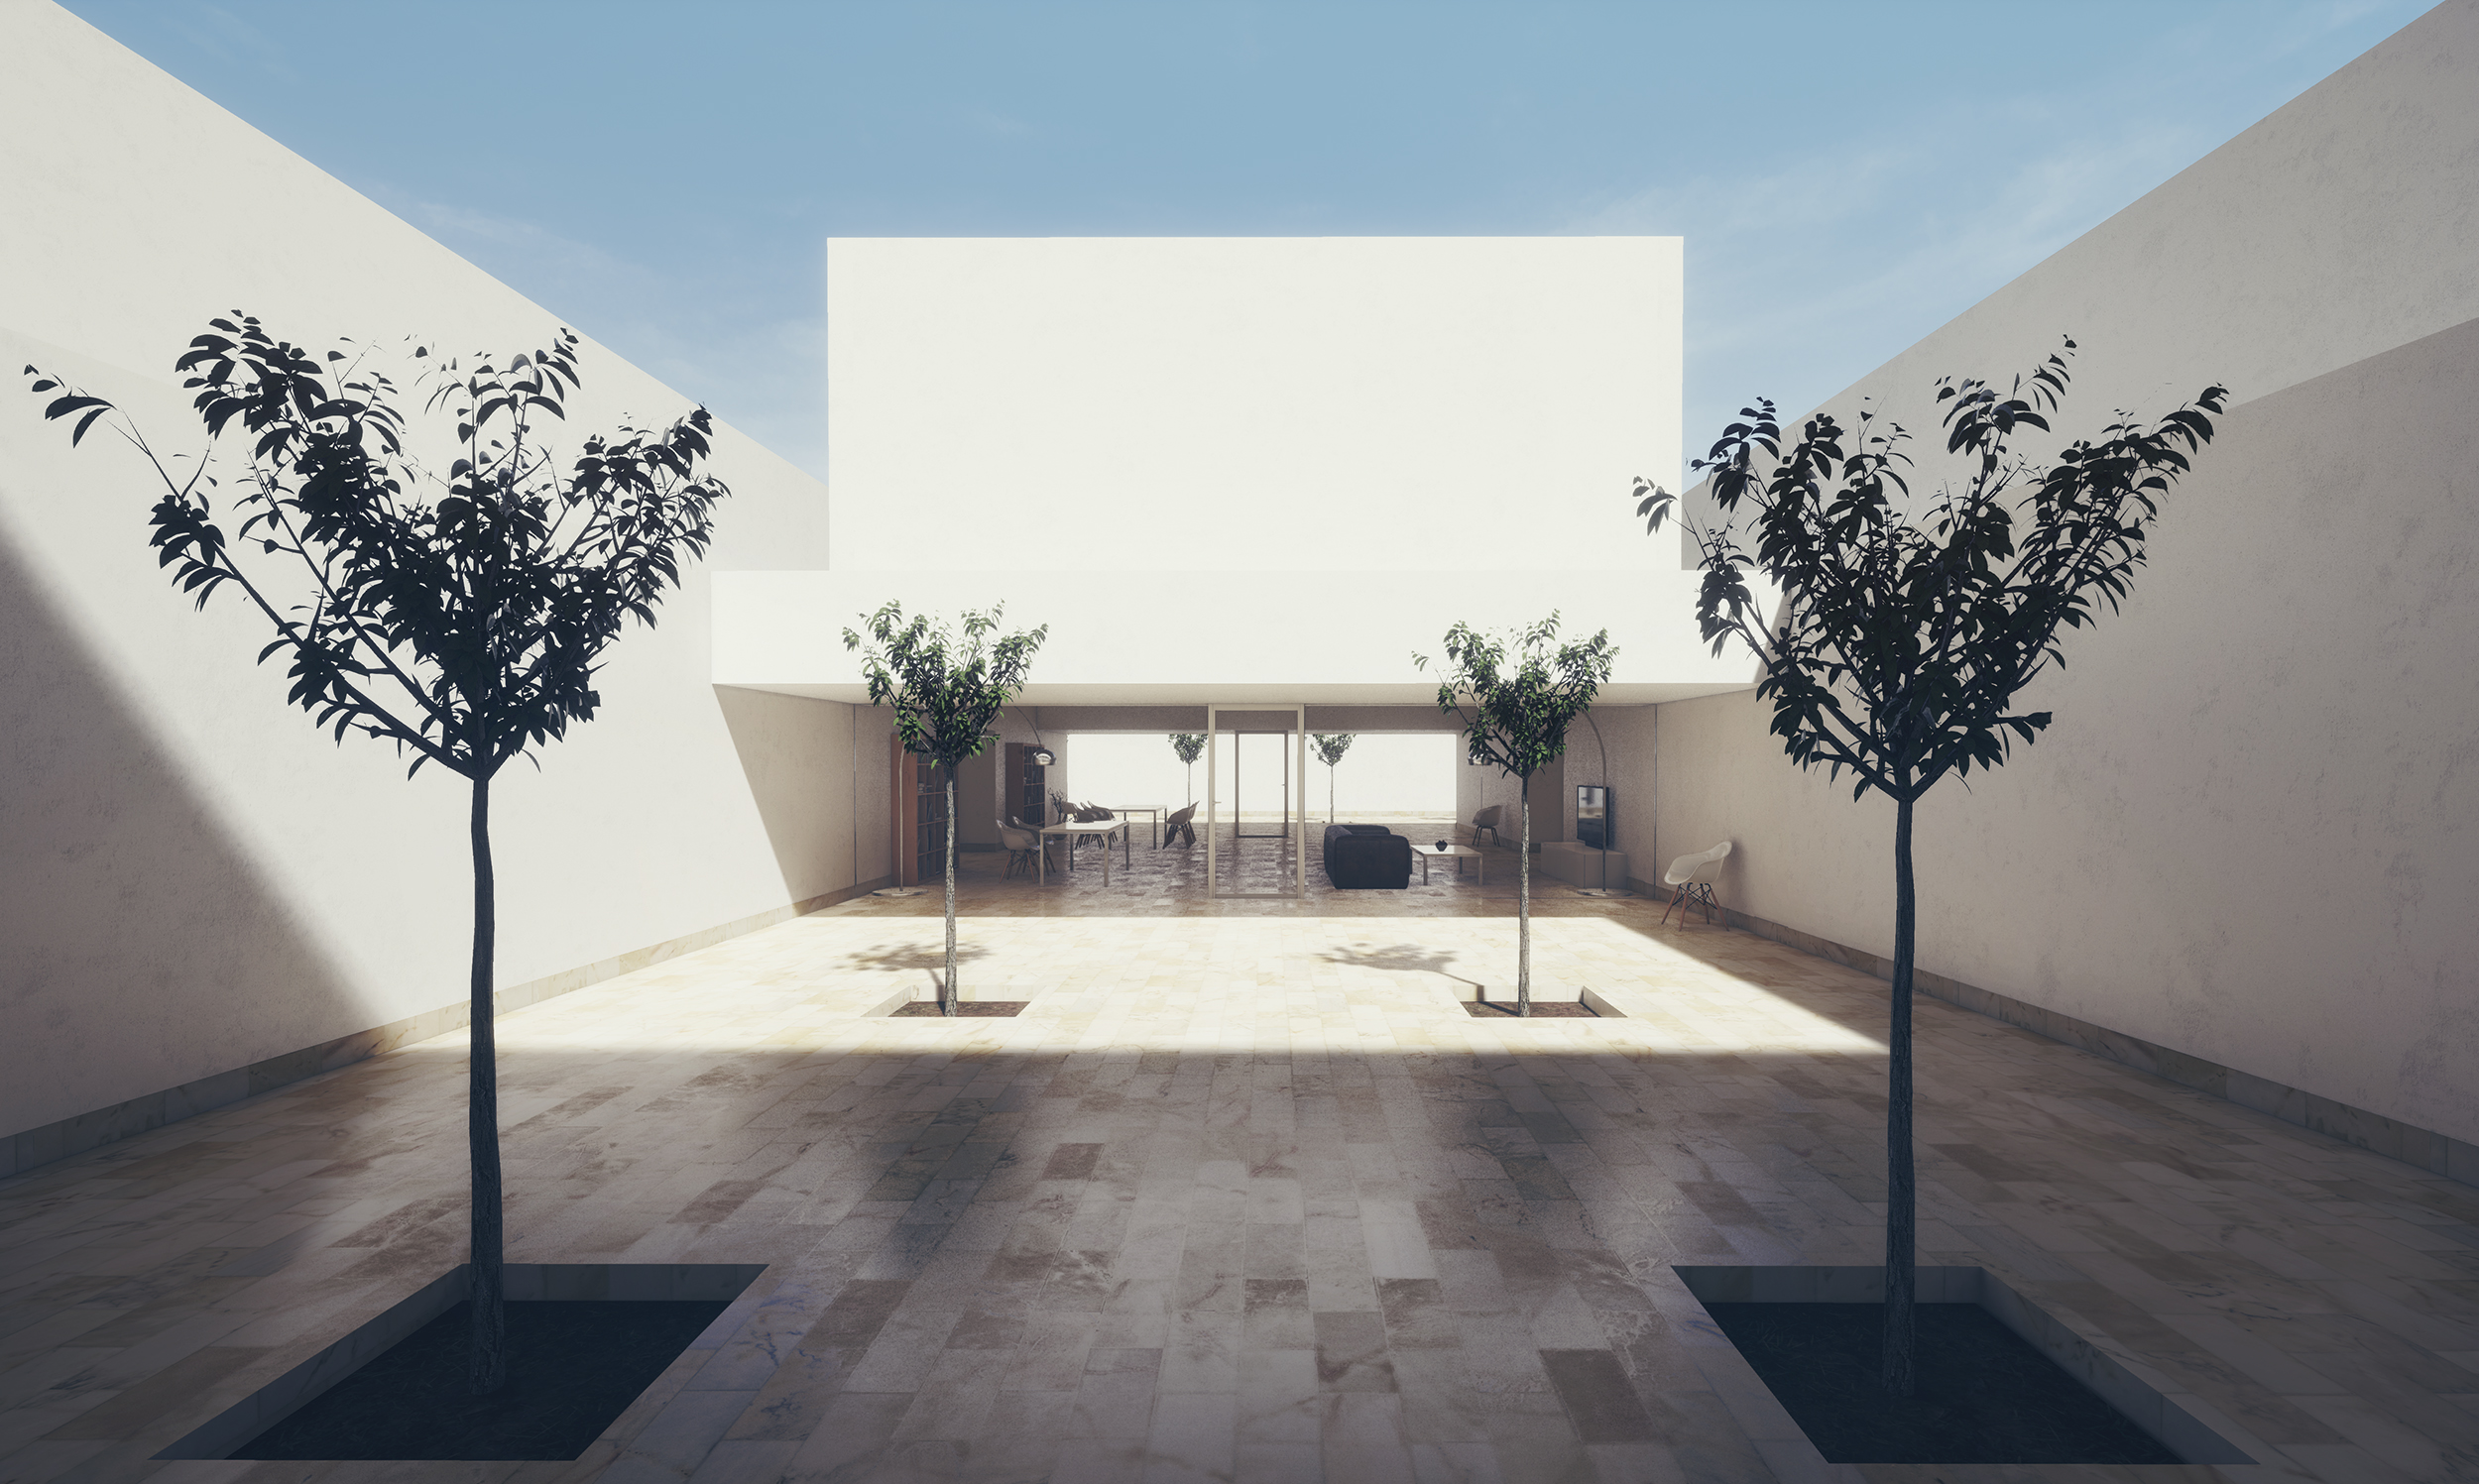 guerrero house by alberto campo baeza unreal engine 4 archviz skyline. Black Bedroom Furniture Sets. Home Design Ideas